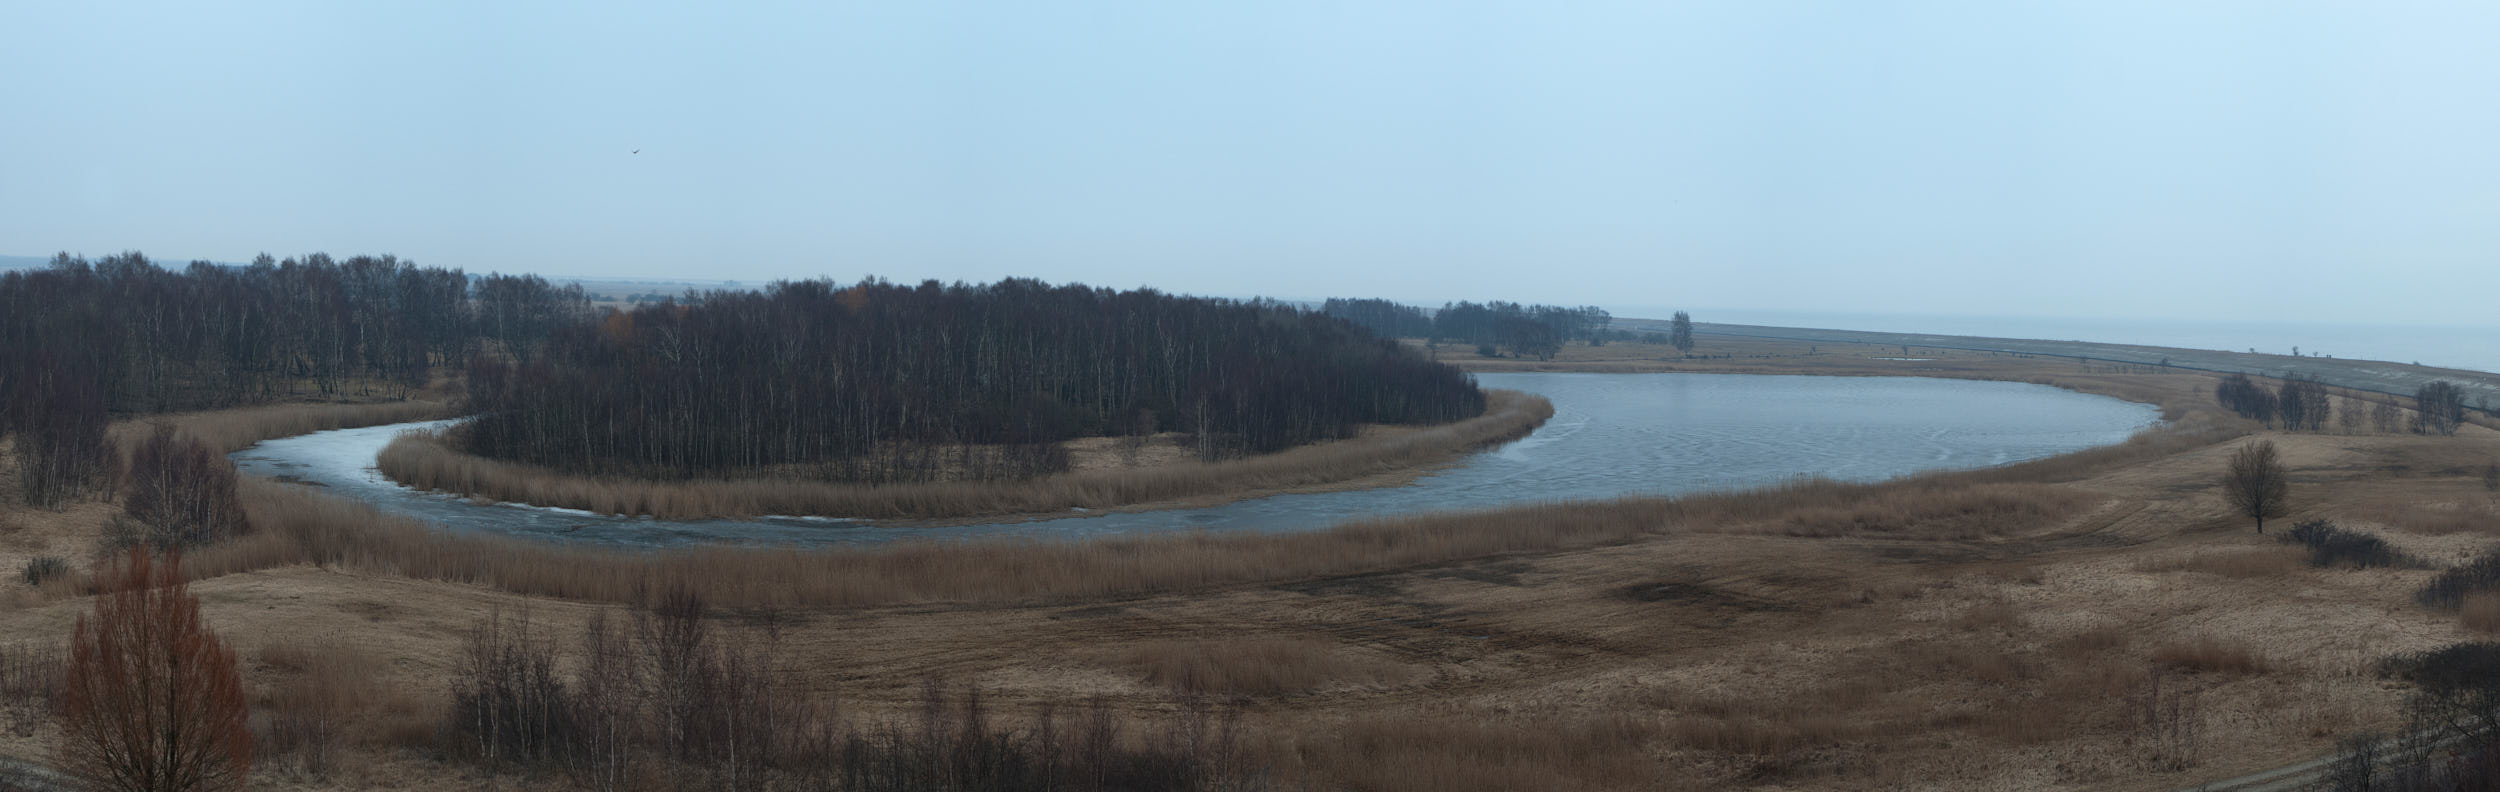 Berkeneiland_Panorama1.jpg